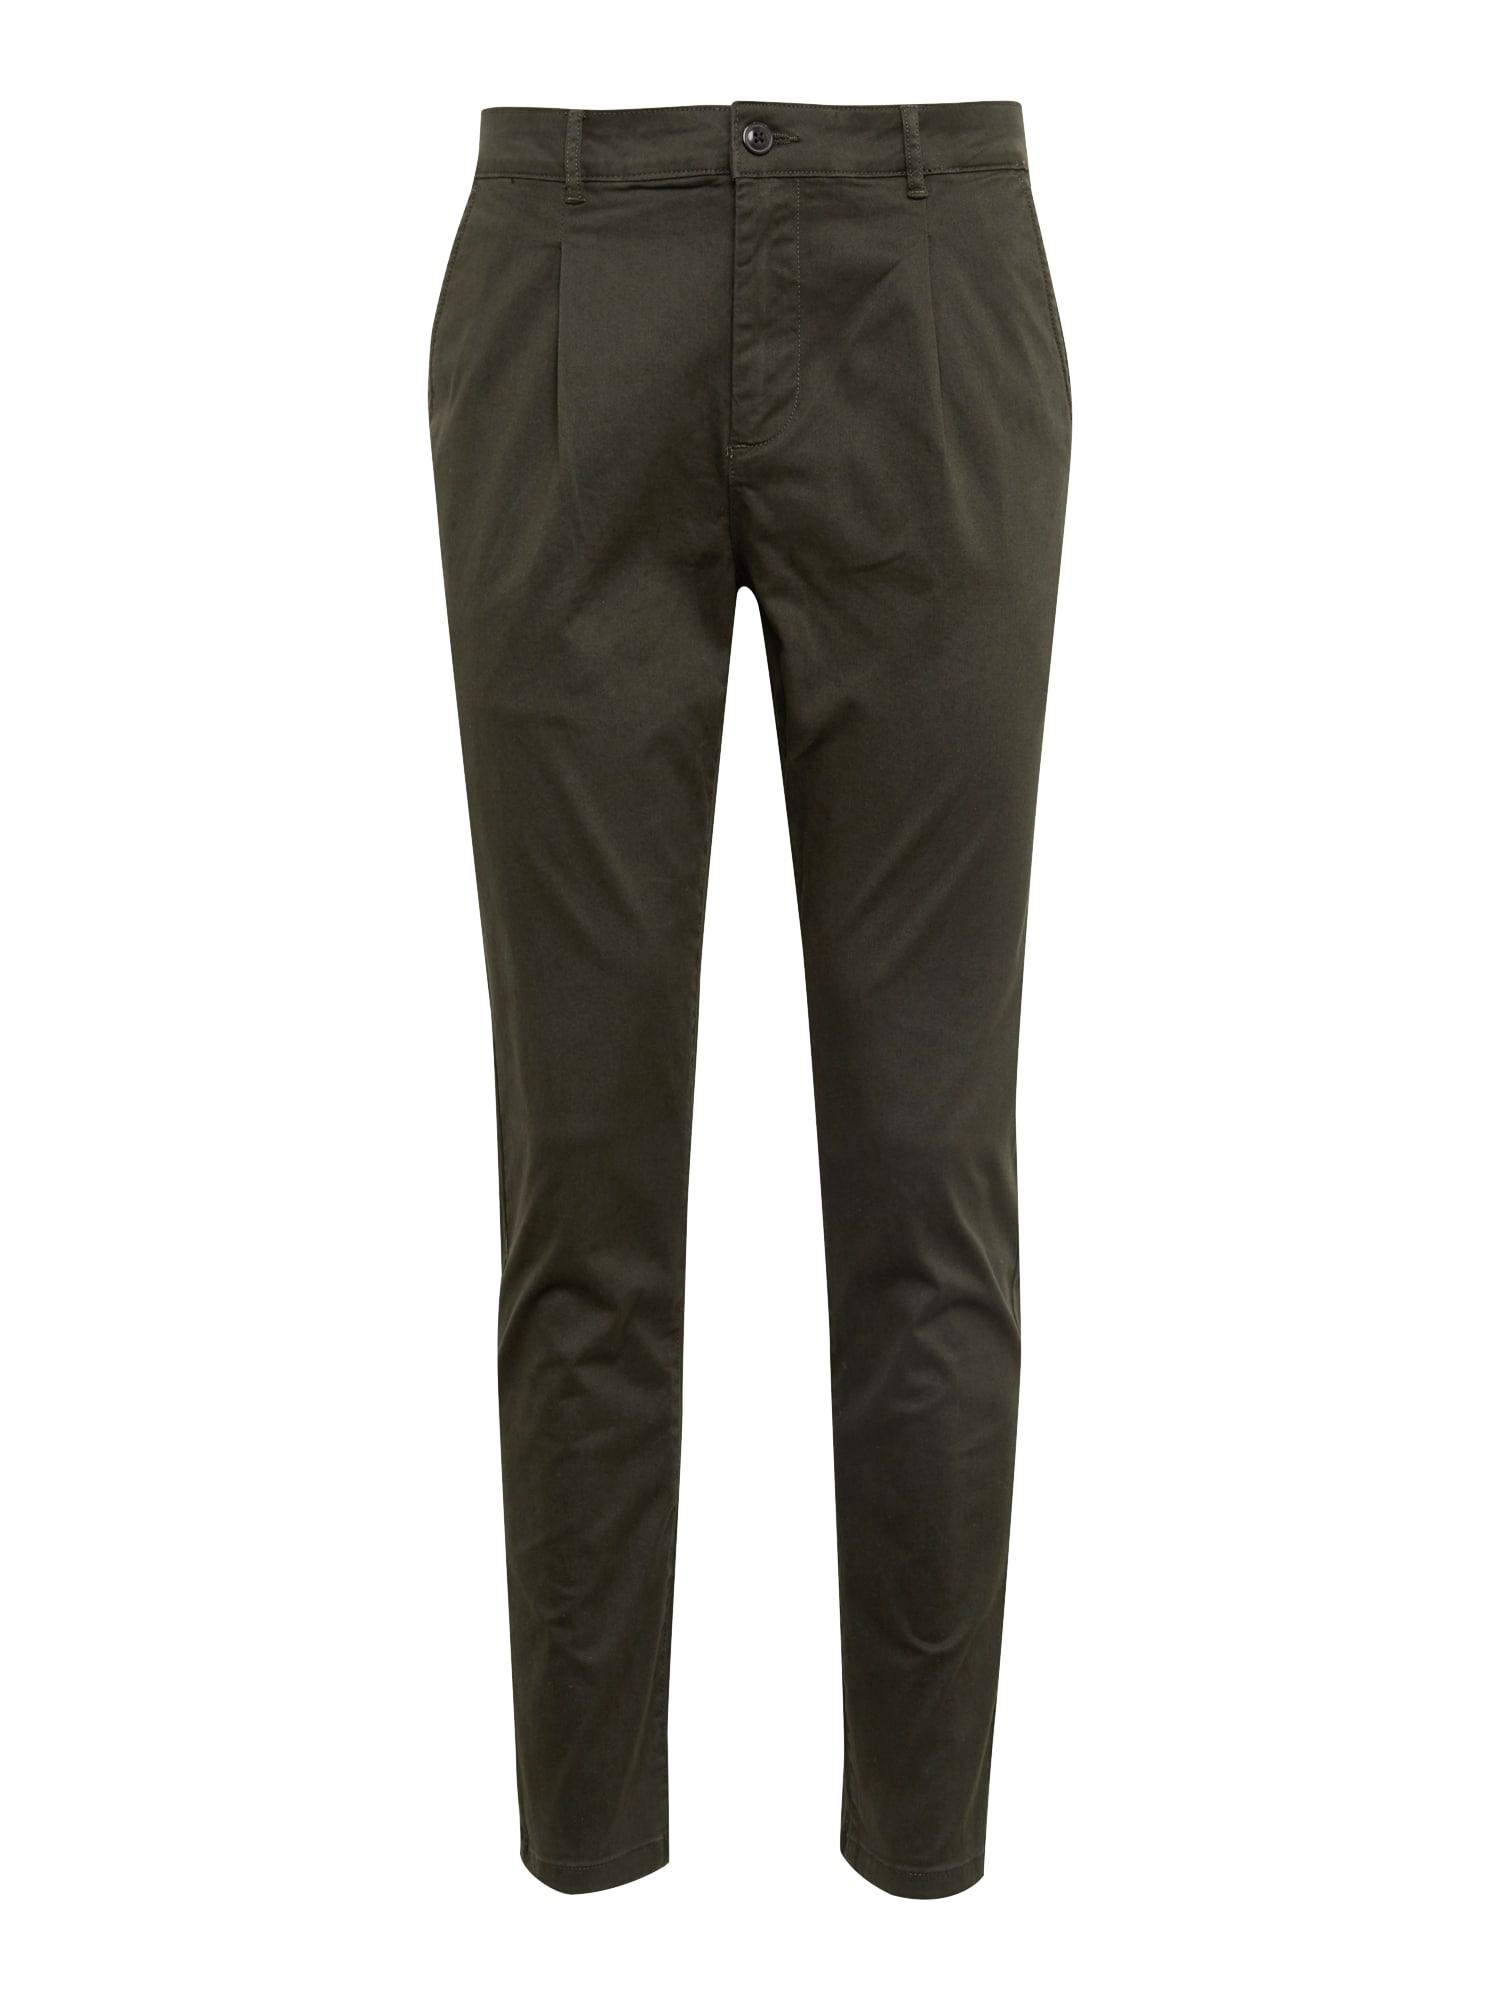 Kalhoty se sklady v pase KM-0718-0602 olivová KIOMI